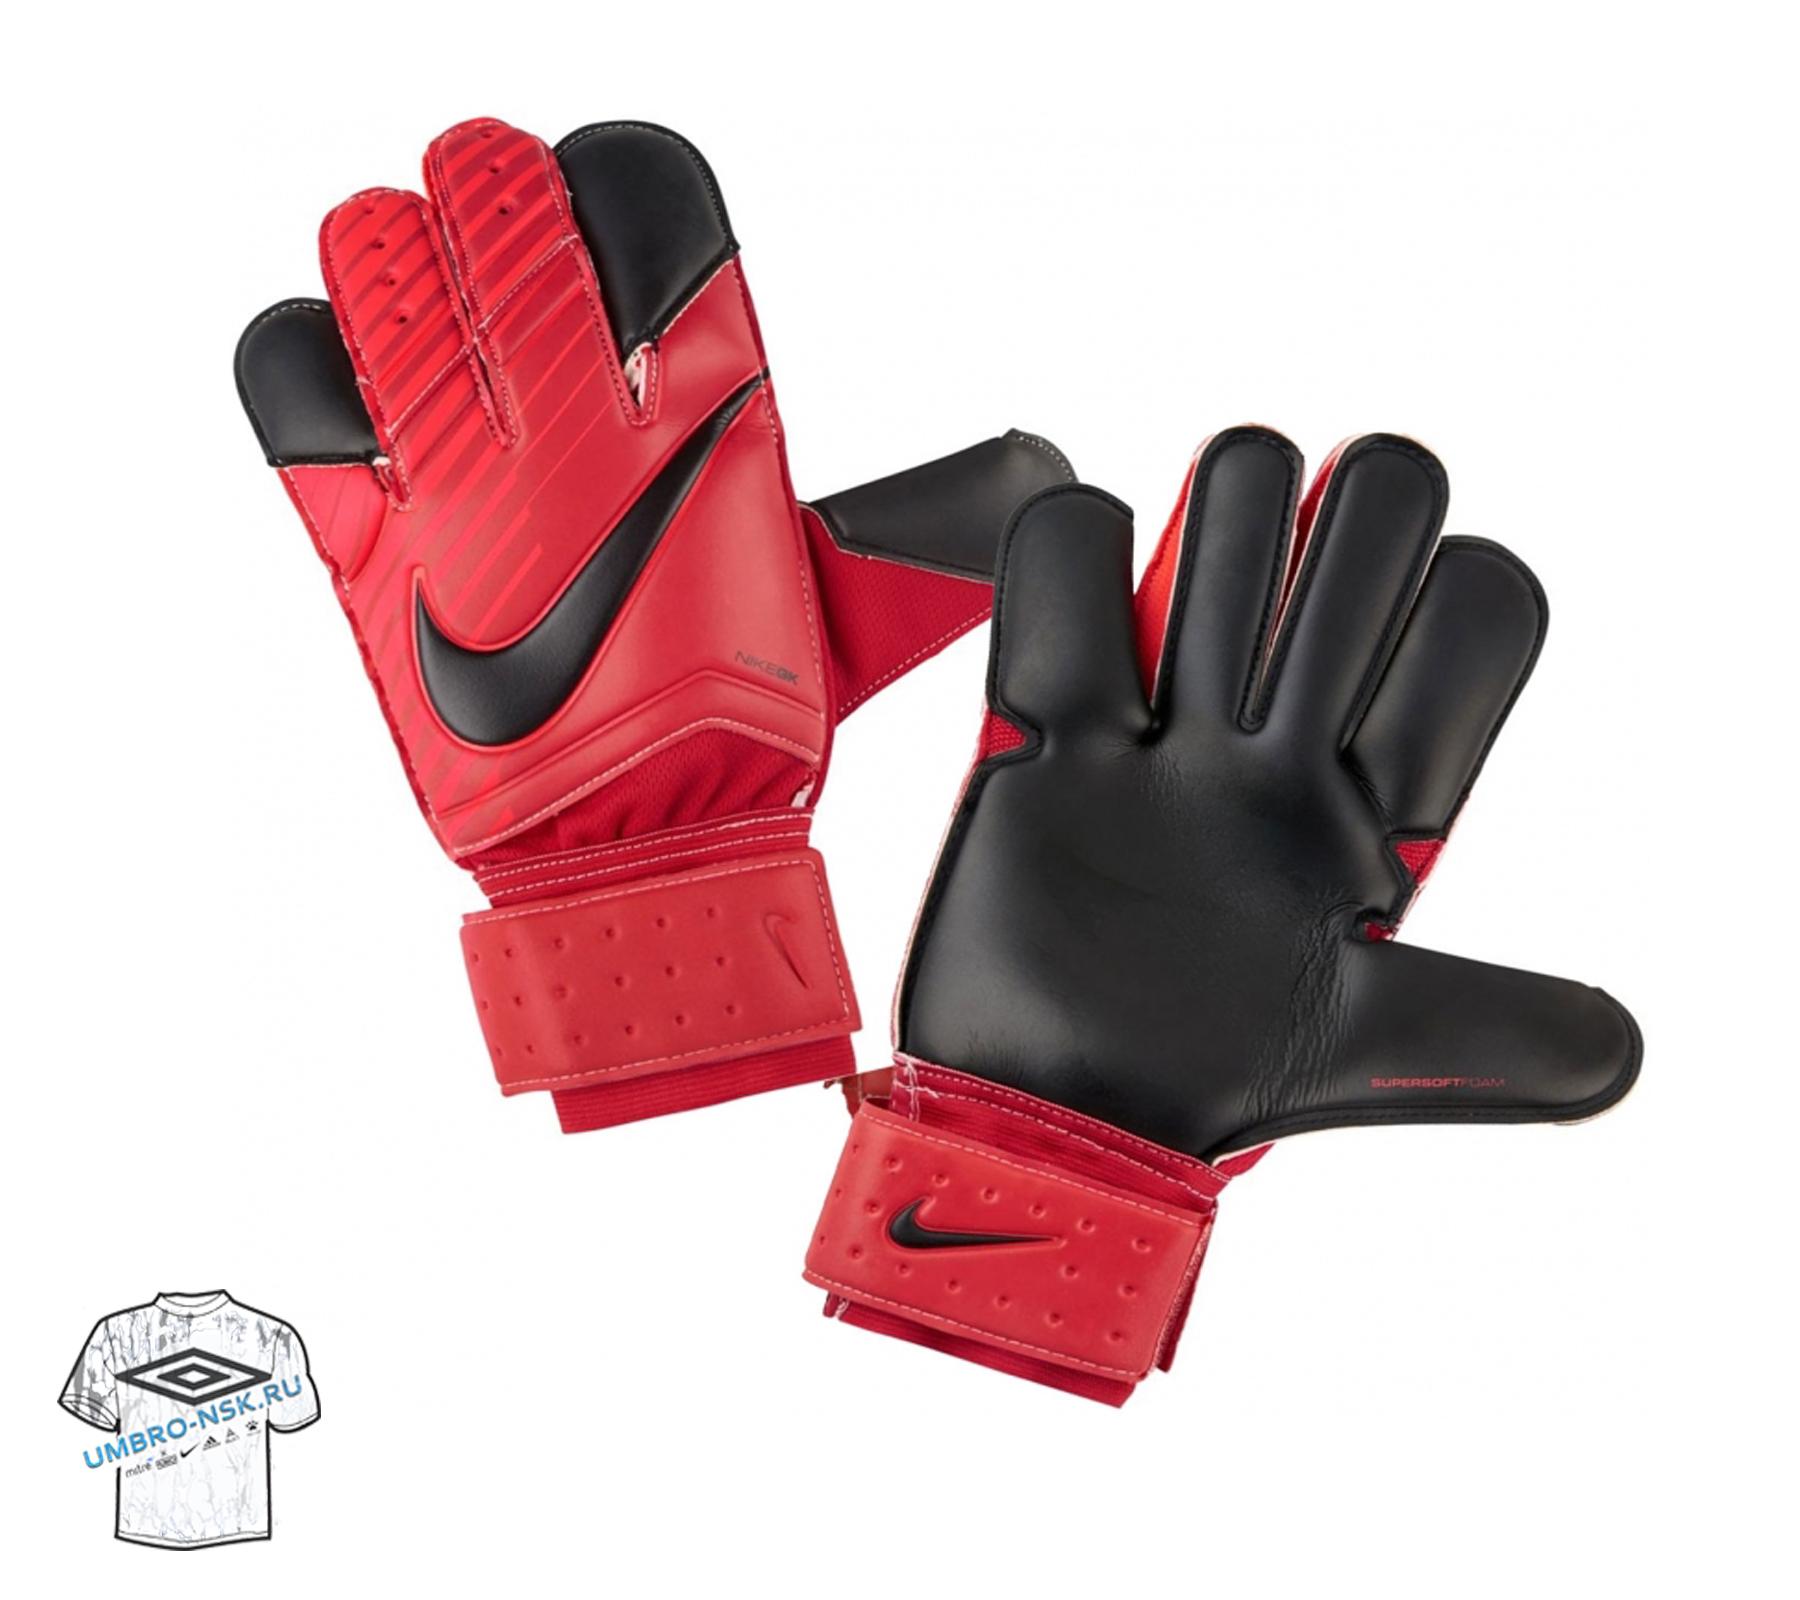 Вратарские перчатки Nike Grip 3 GS0342-657   Интернет-магазин 920ffdc2ab8